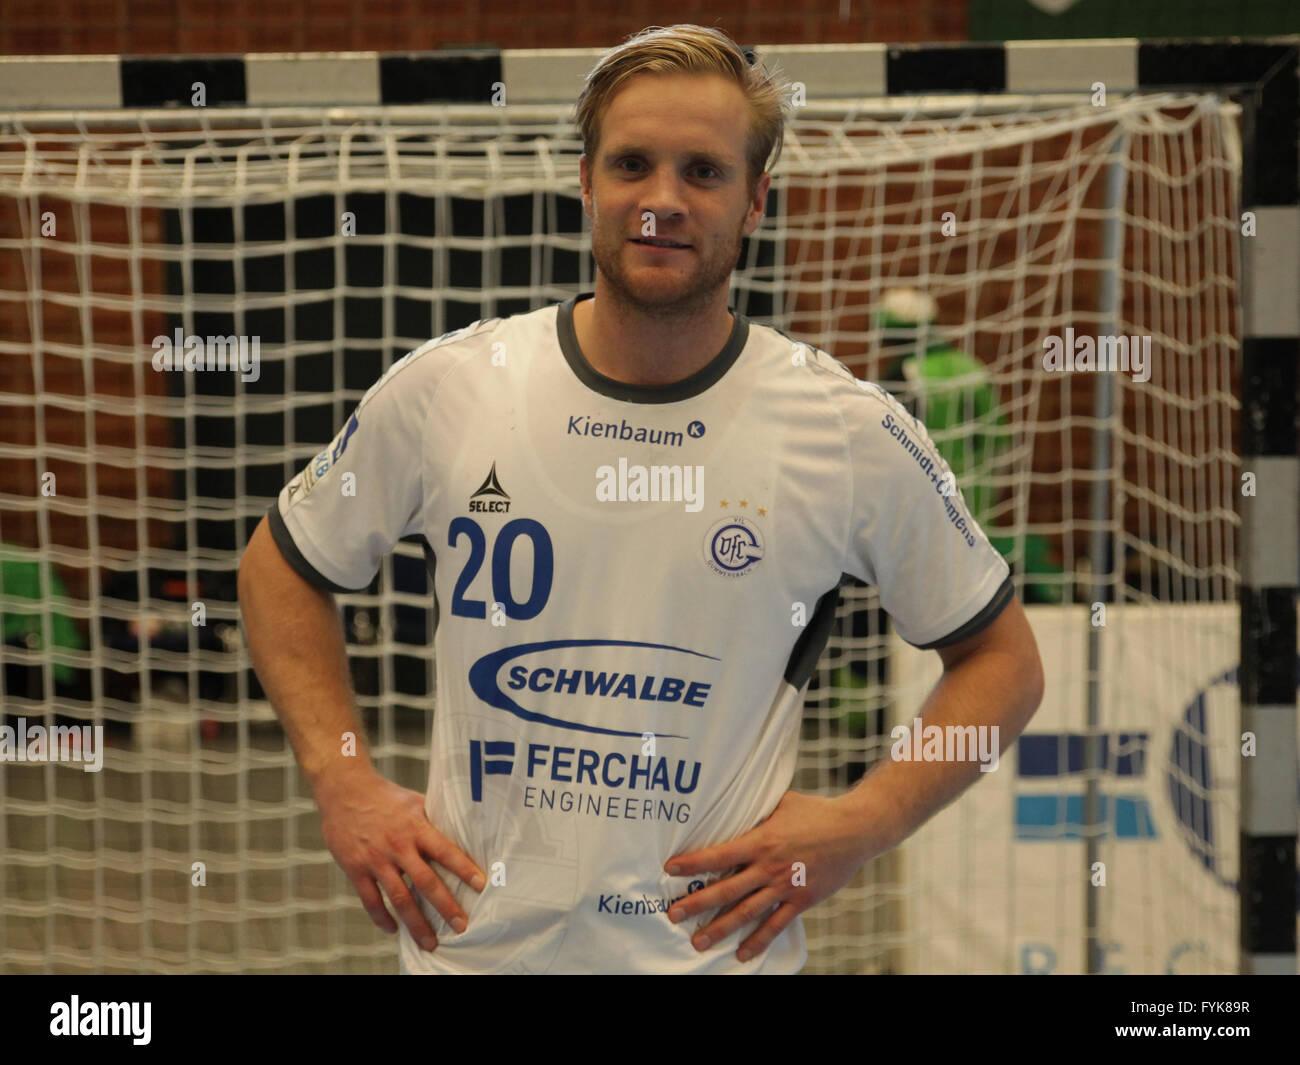 Gunnar Steinn Jónsson - VfL Gummersbach - Stock Image